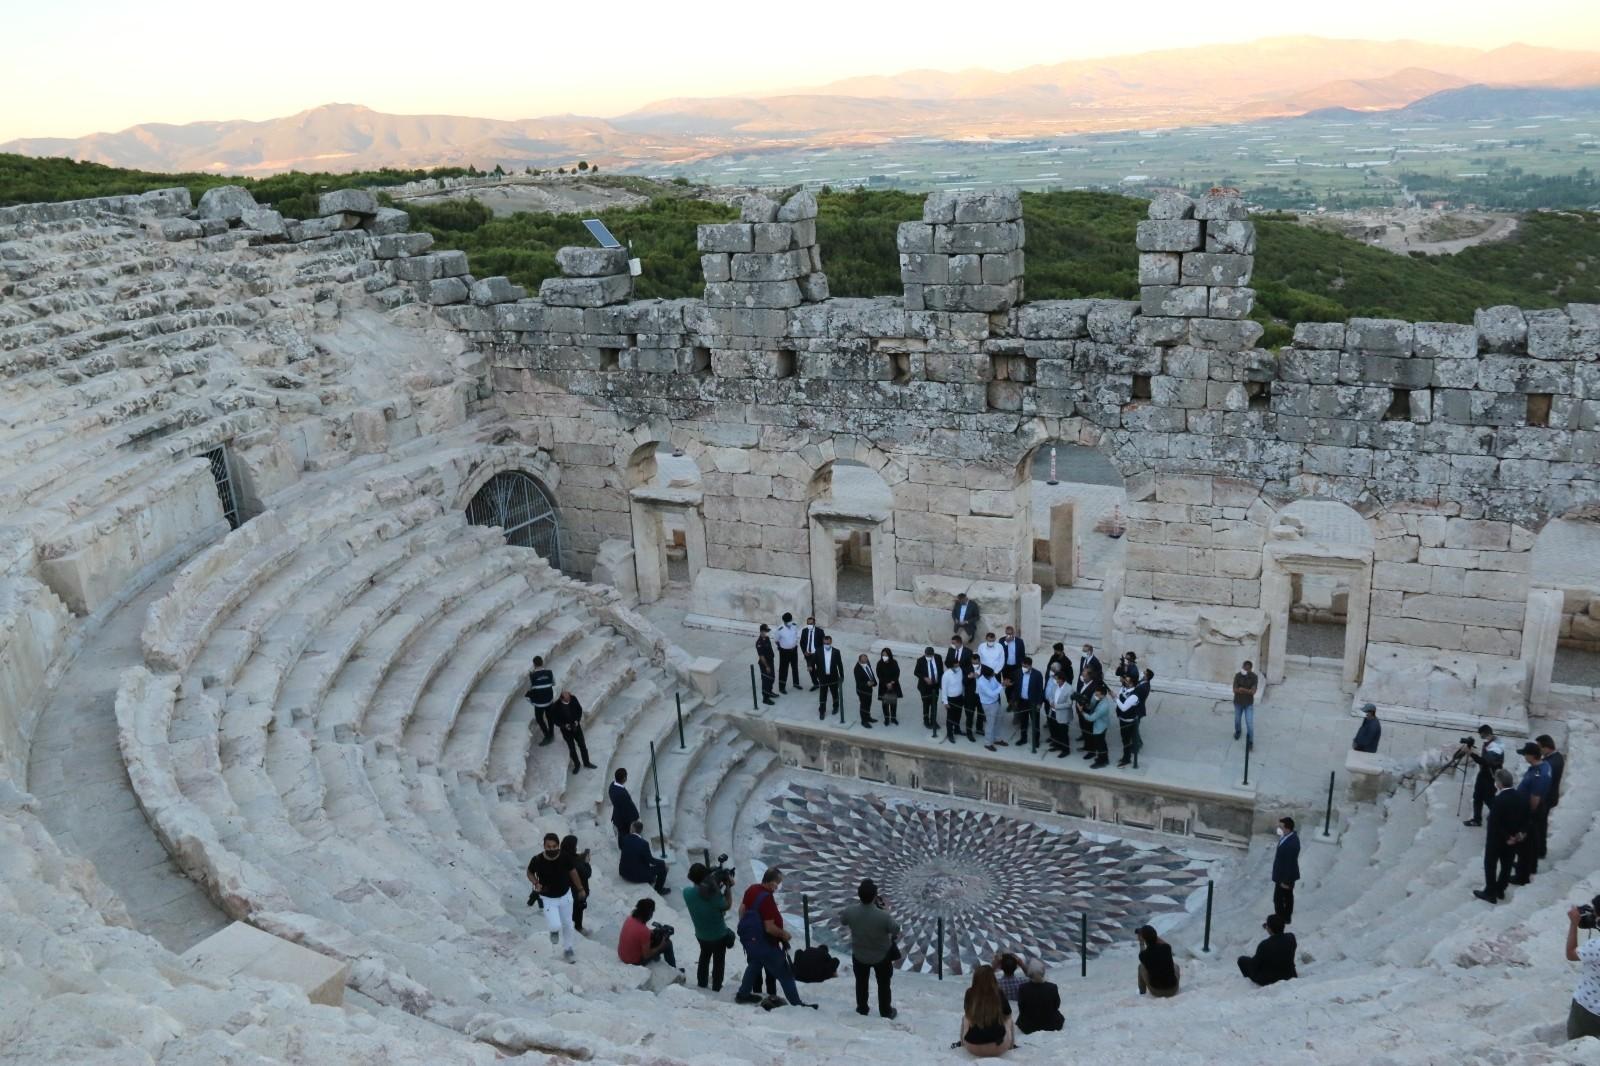 Bakan Kurum, Kibyra Antik Kenti'nde incelemelerde bulundu